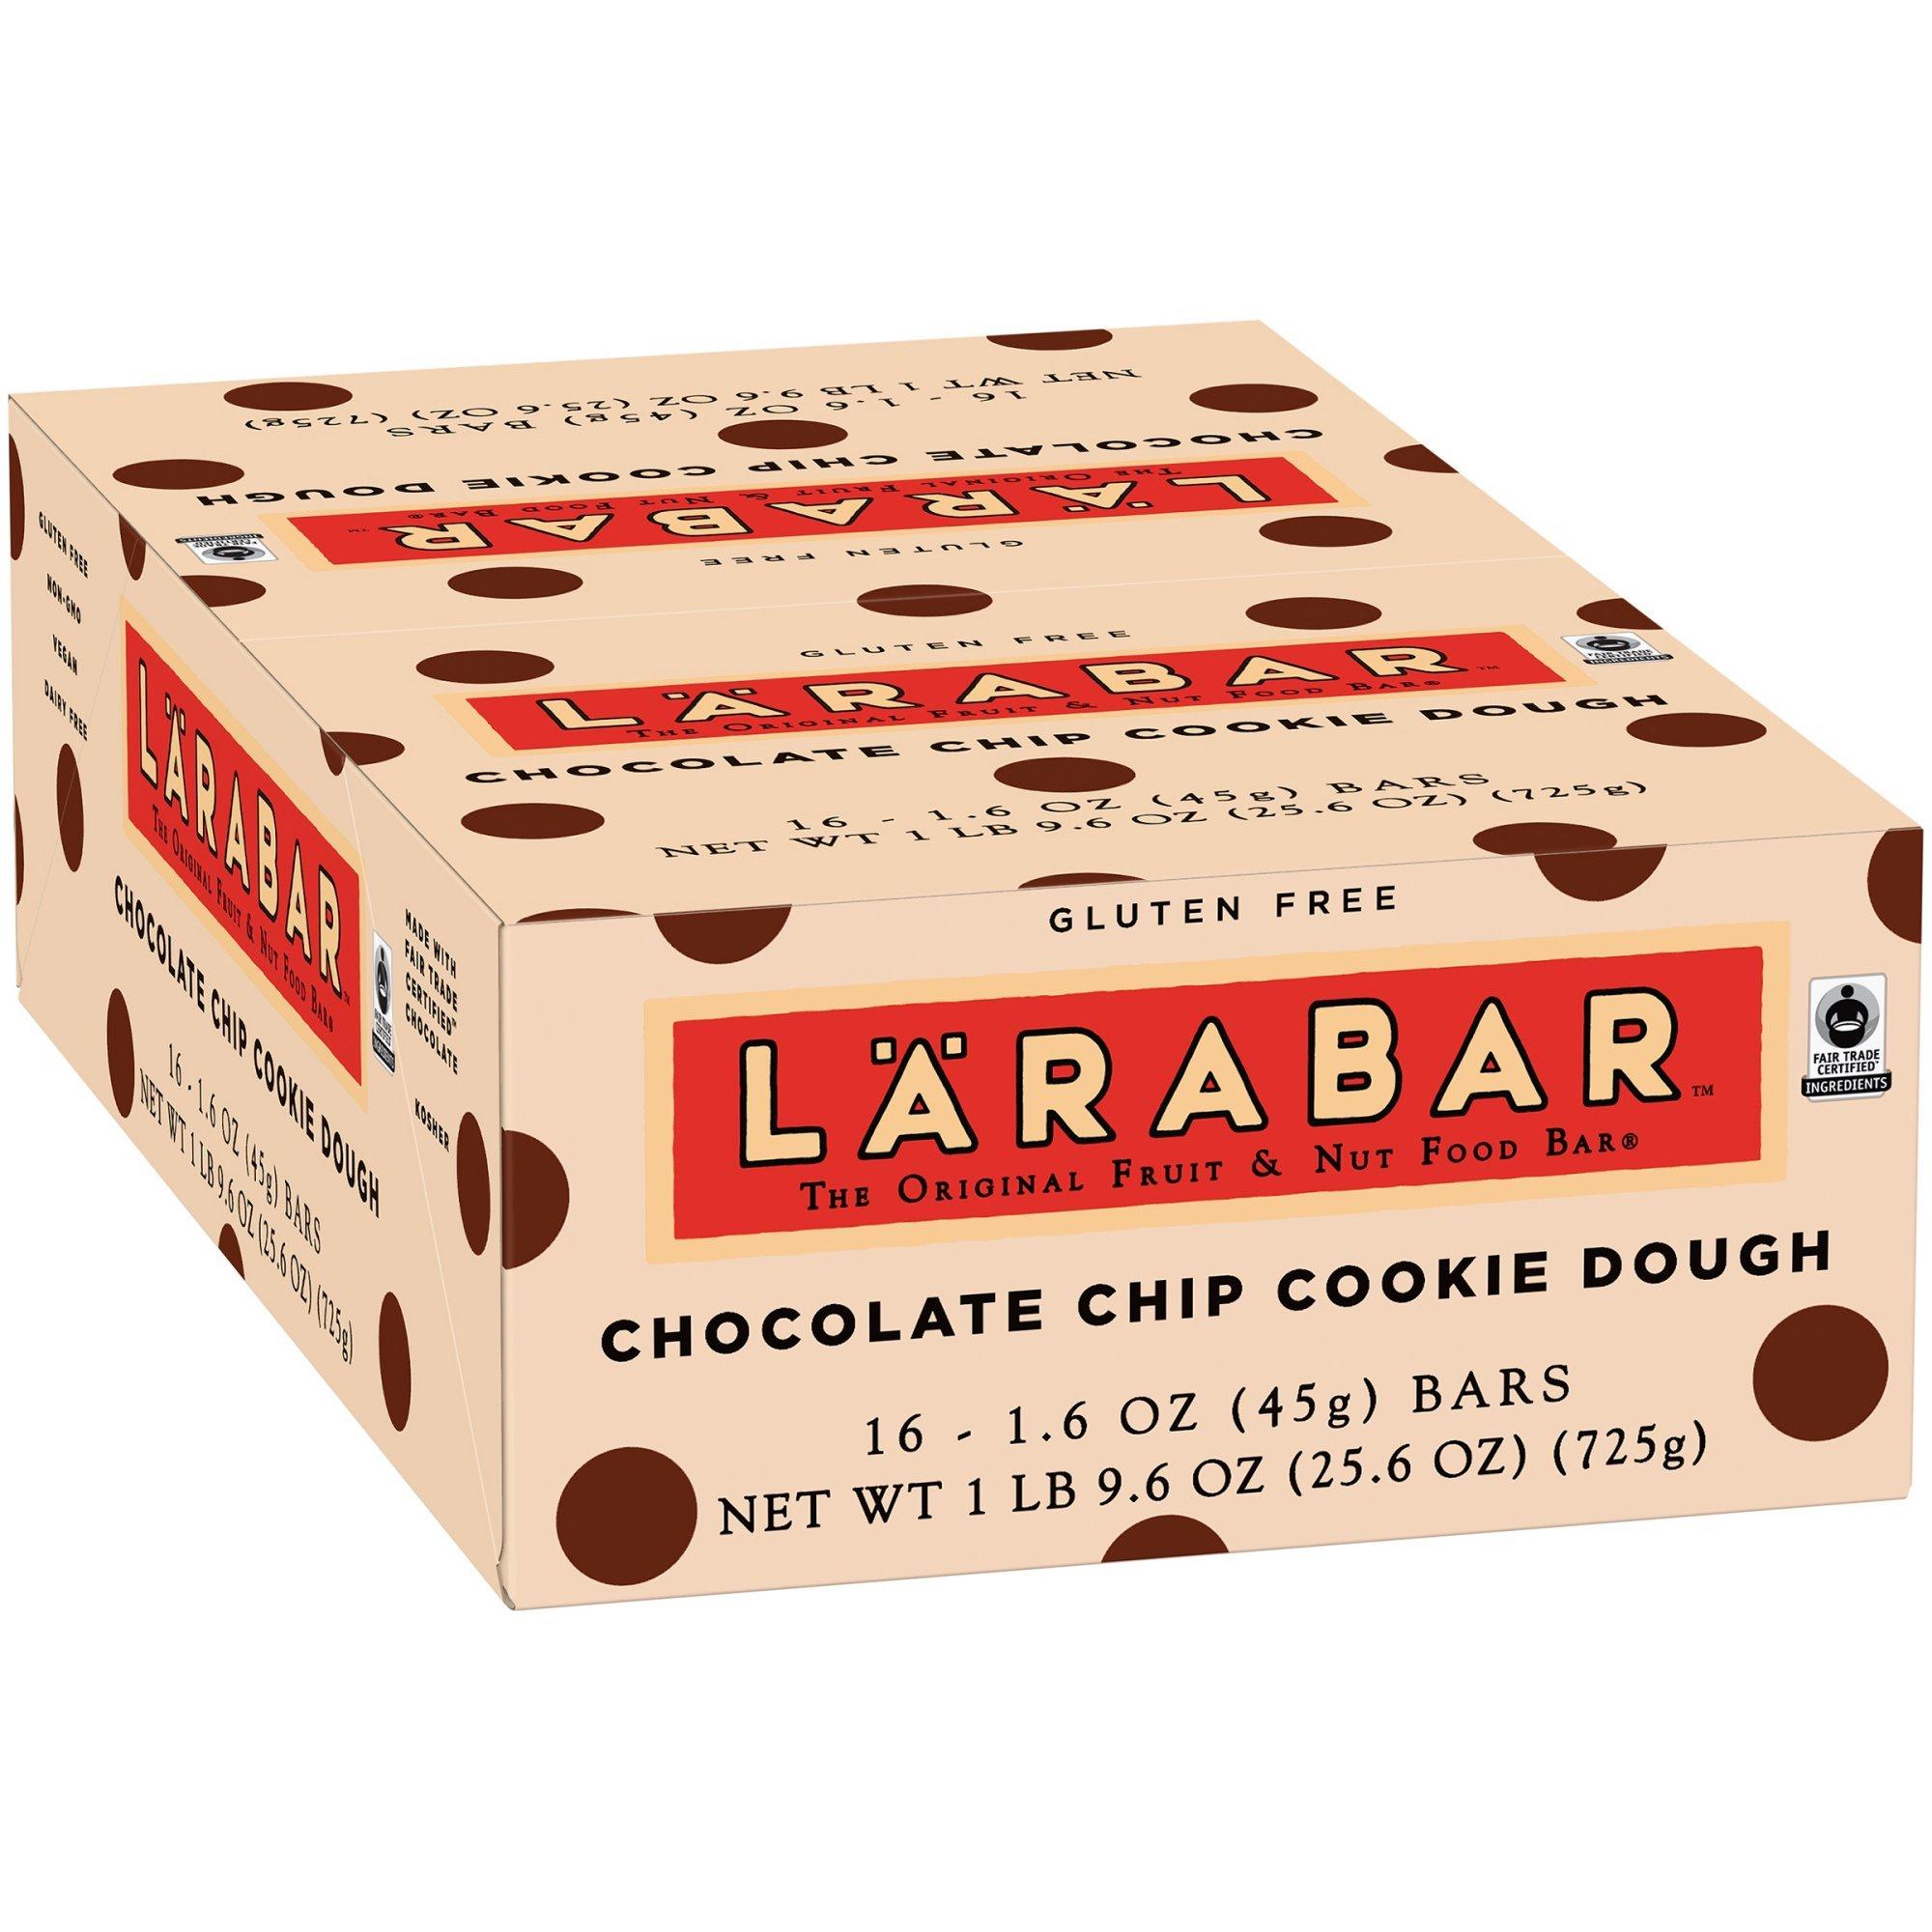 Lärabar Chocolate Chip Cookie Dough Fruit & Nut Bars 16 ct Box (Pack of 5) by Larabar (Image #6)